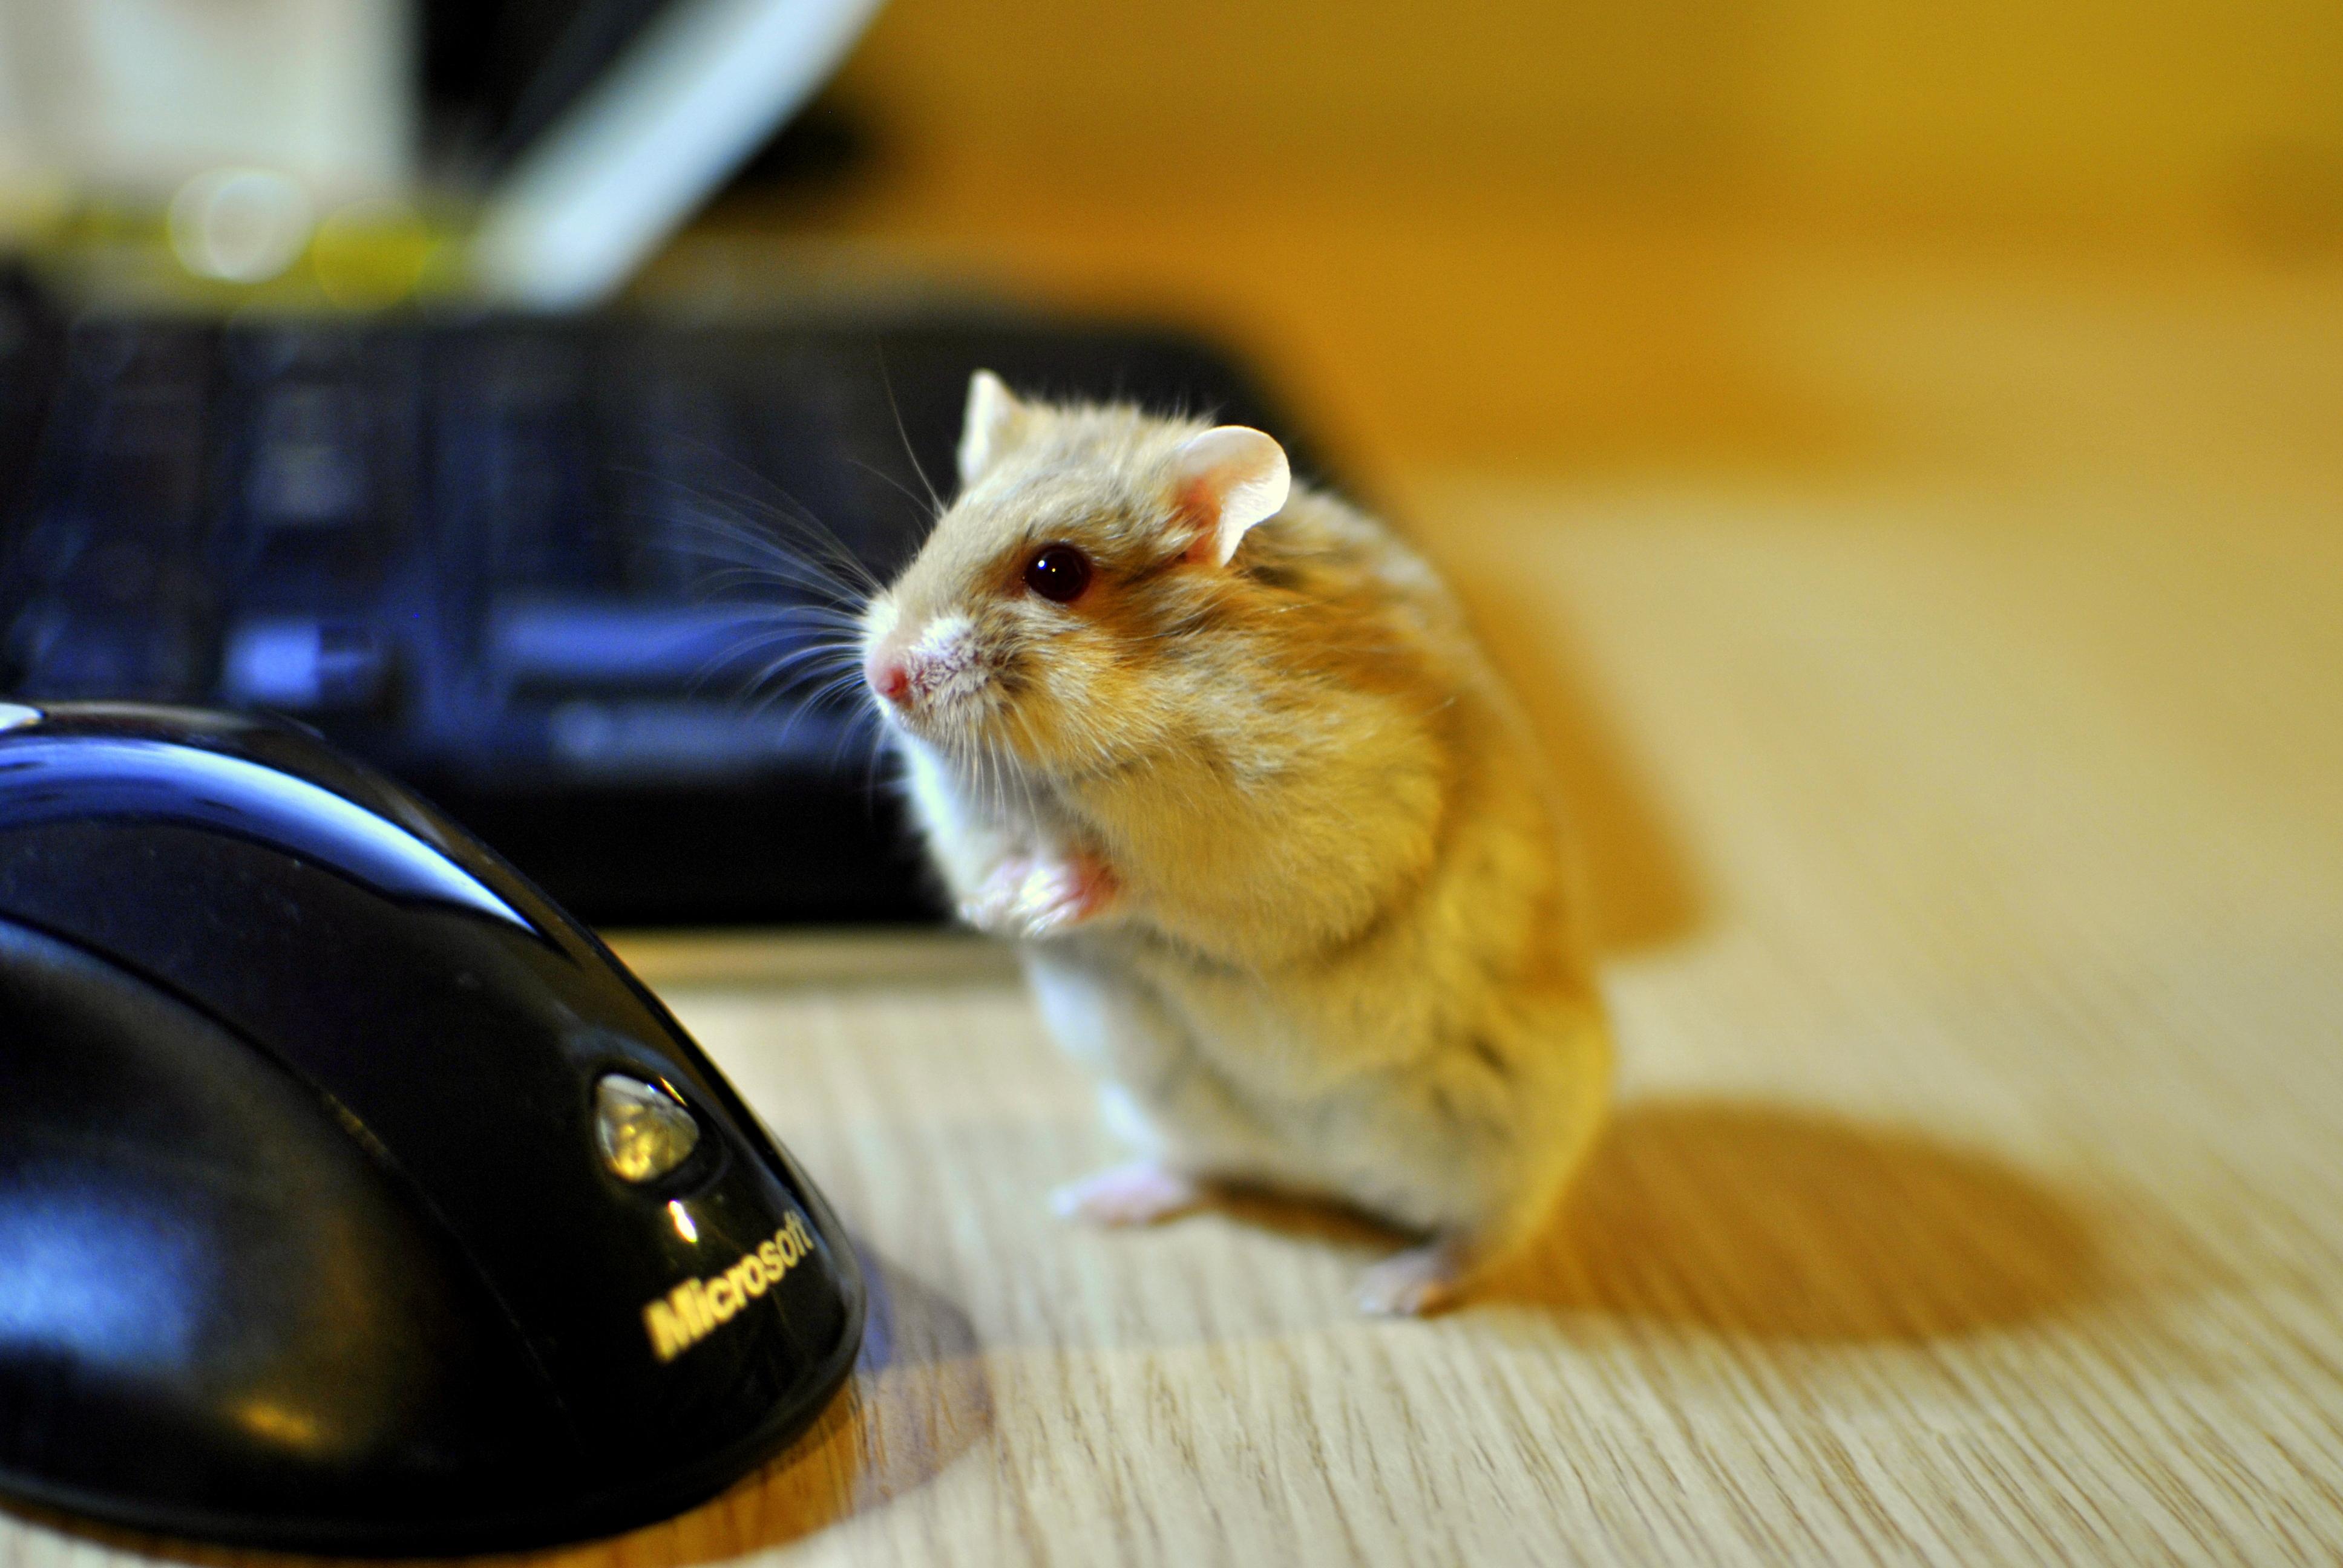 Hamster by MelihERSAHiN